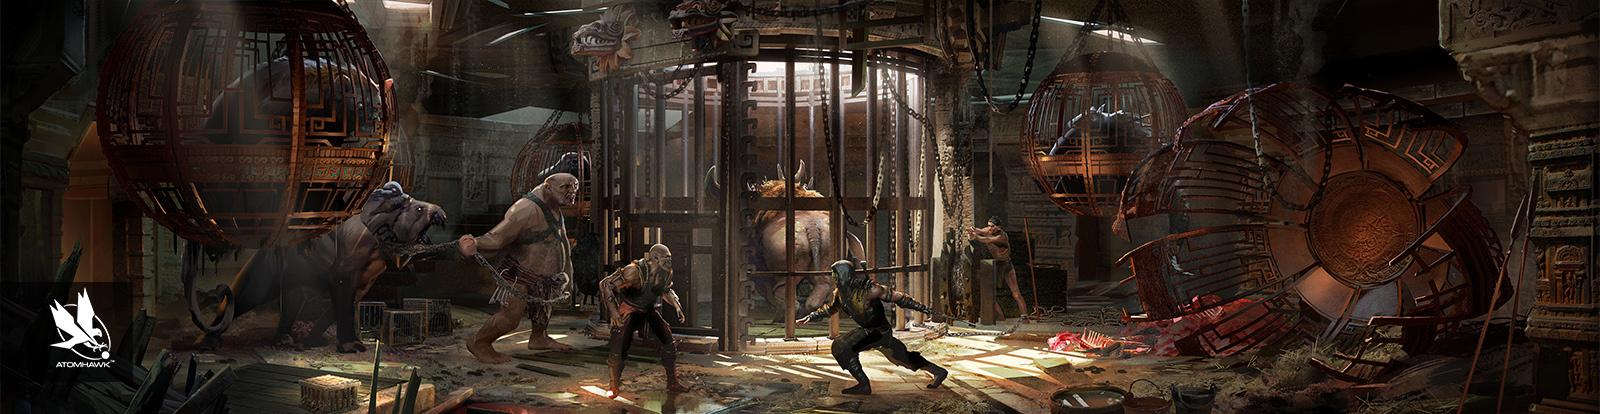 Atomhawk_Warner-Bros-NetherRealm_Mortal-Kombat-11_Concept-Art_Environment-Design_Bestiary_Day.jpg